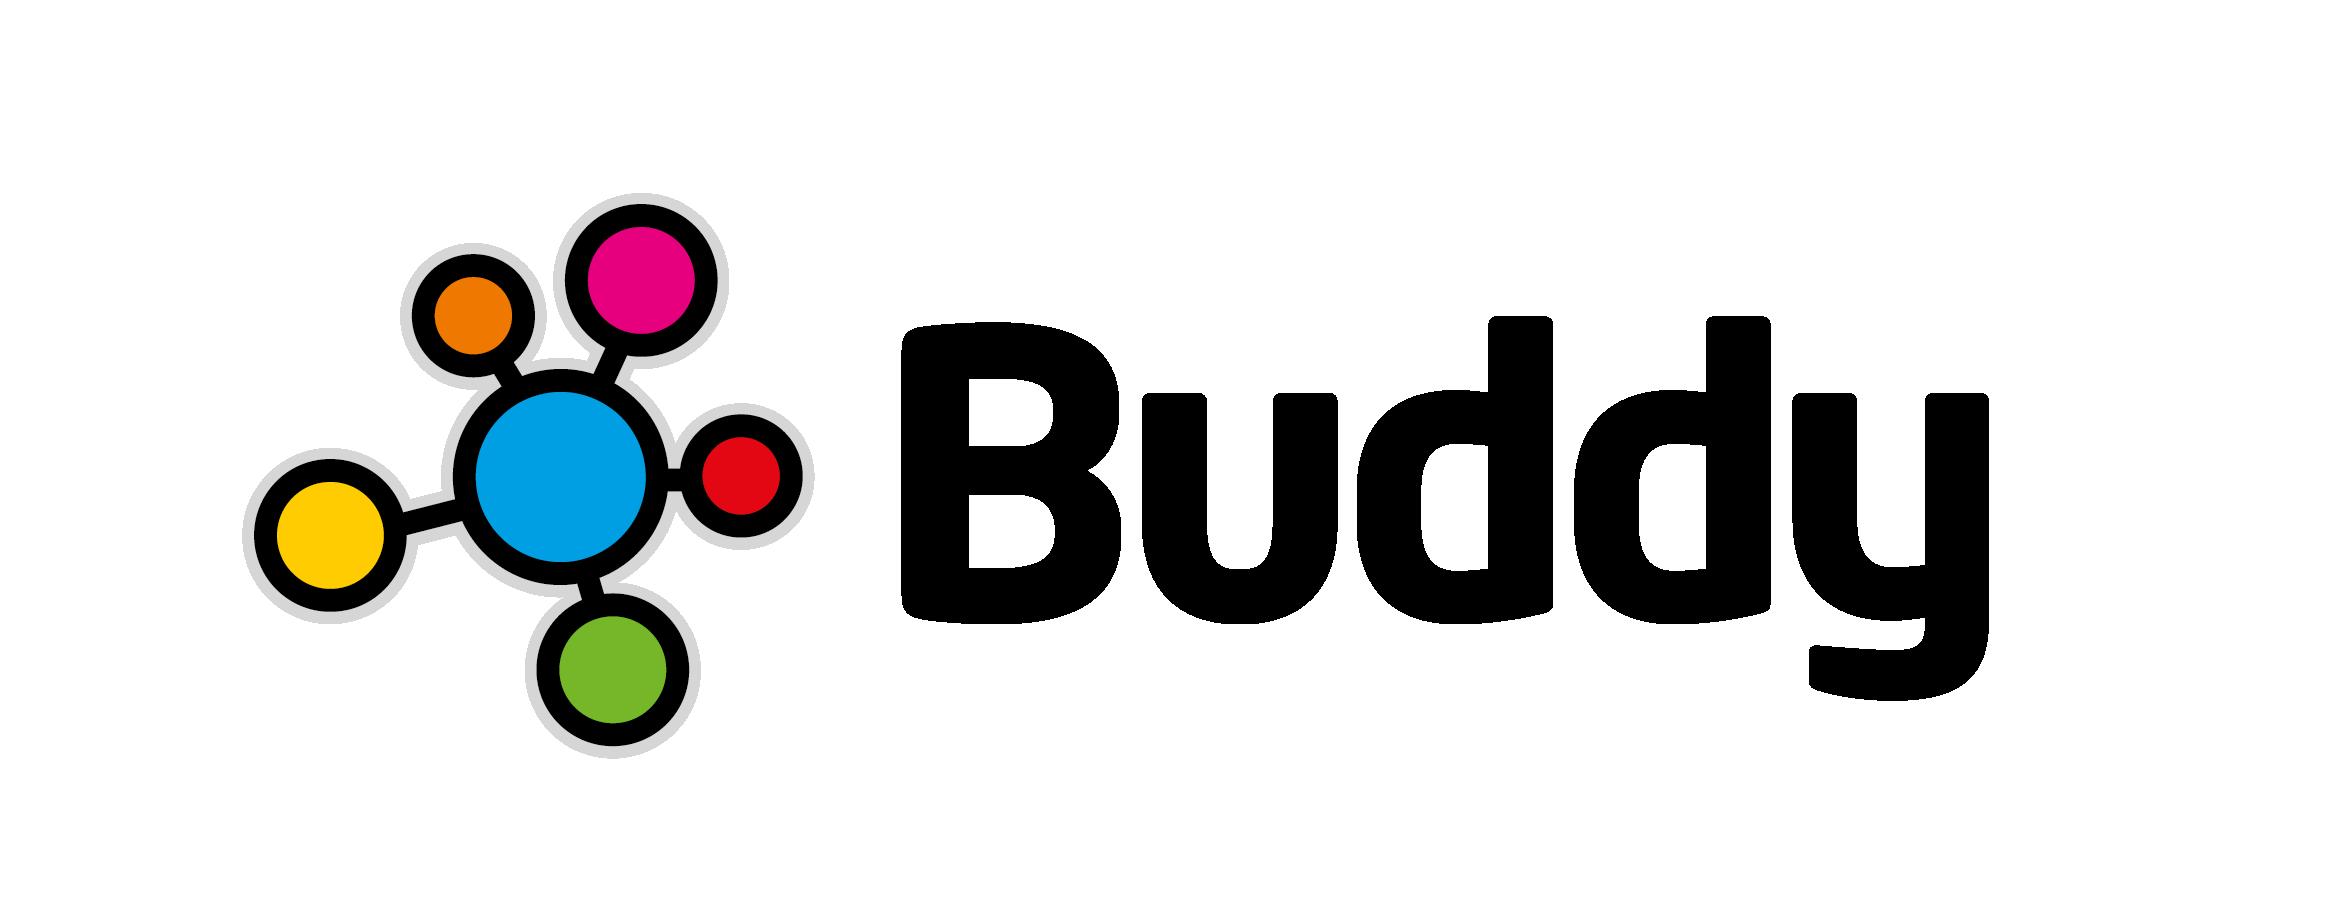 Buddy Final v3 CMYK-01.png